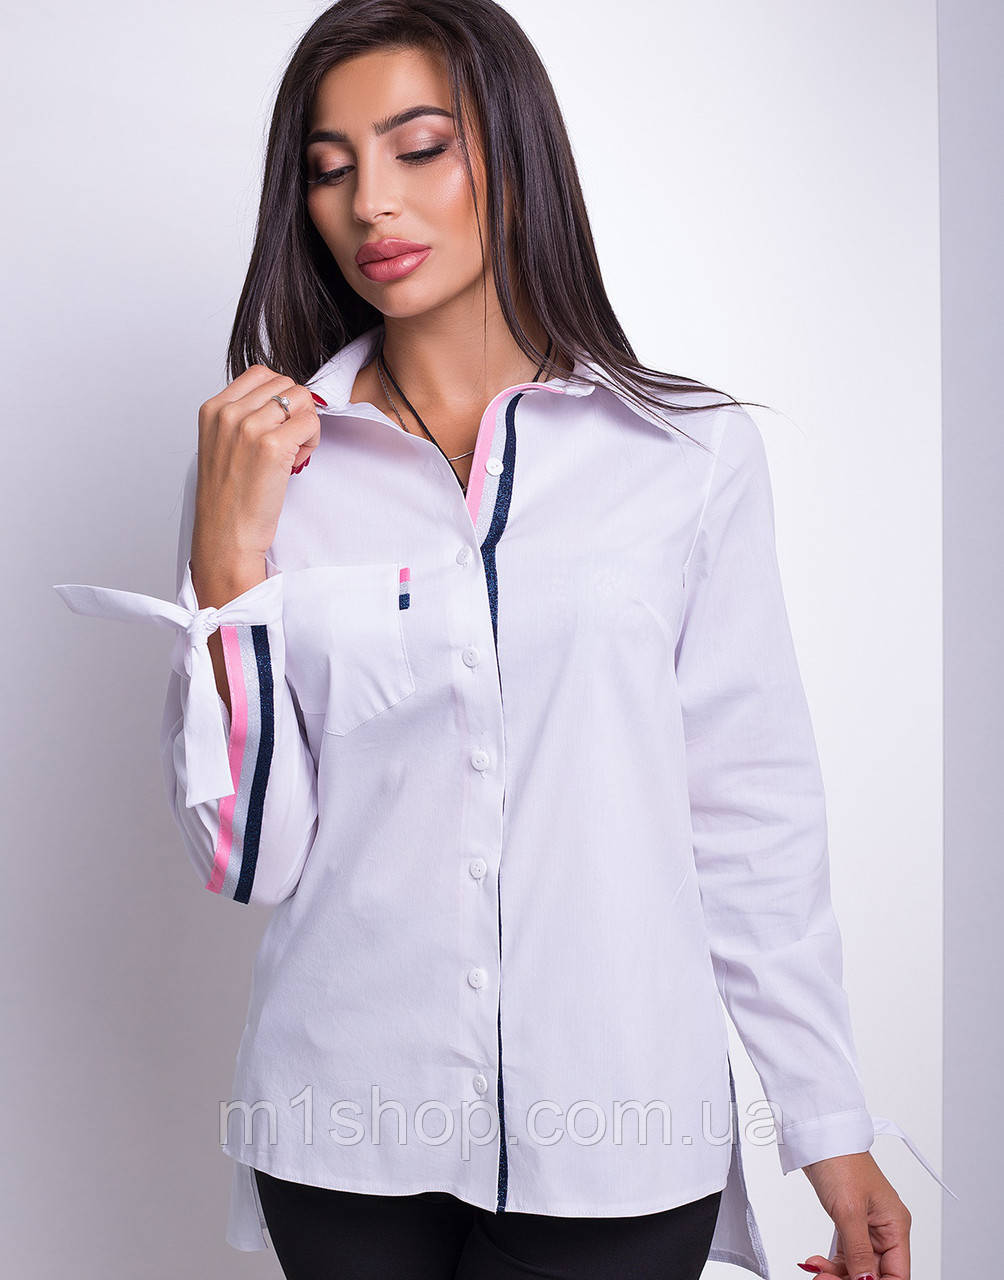 Женская рубашка с завязками на рукавах (Кураж lzn)